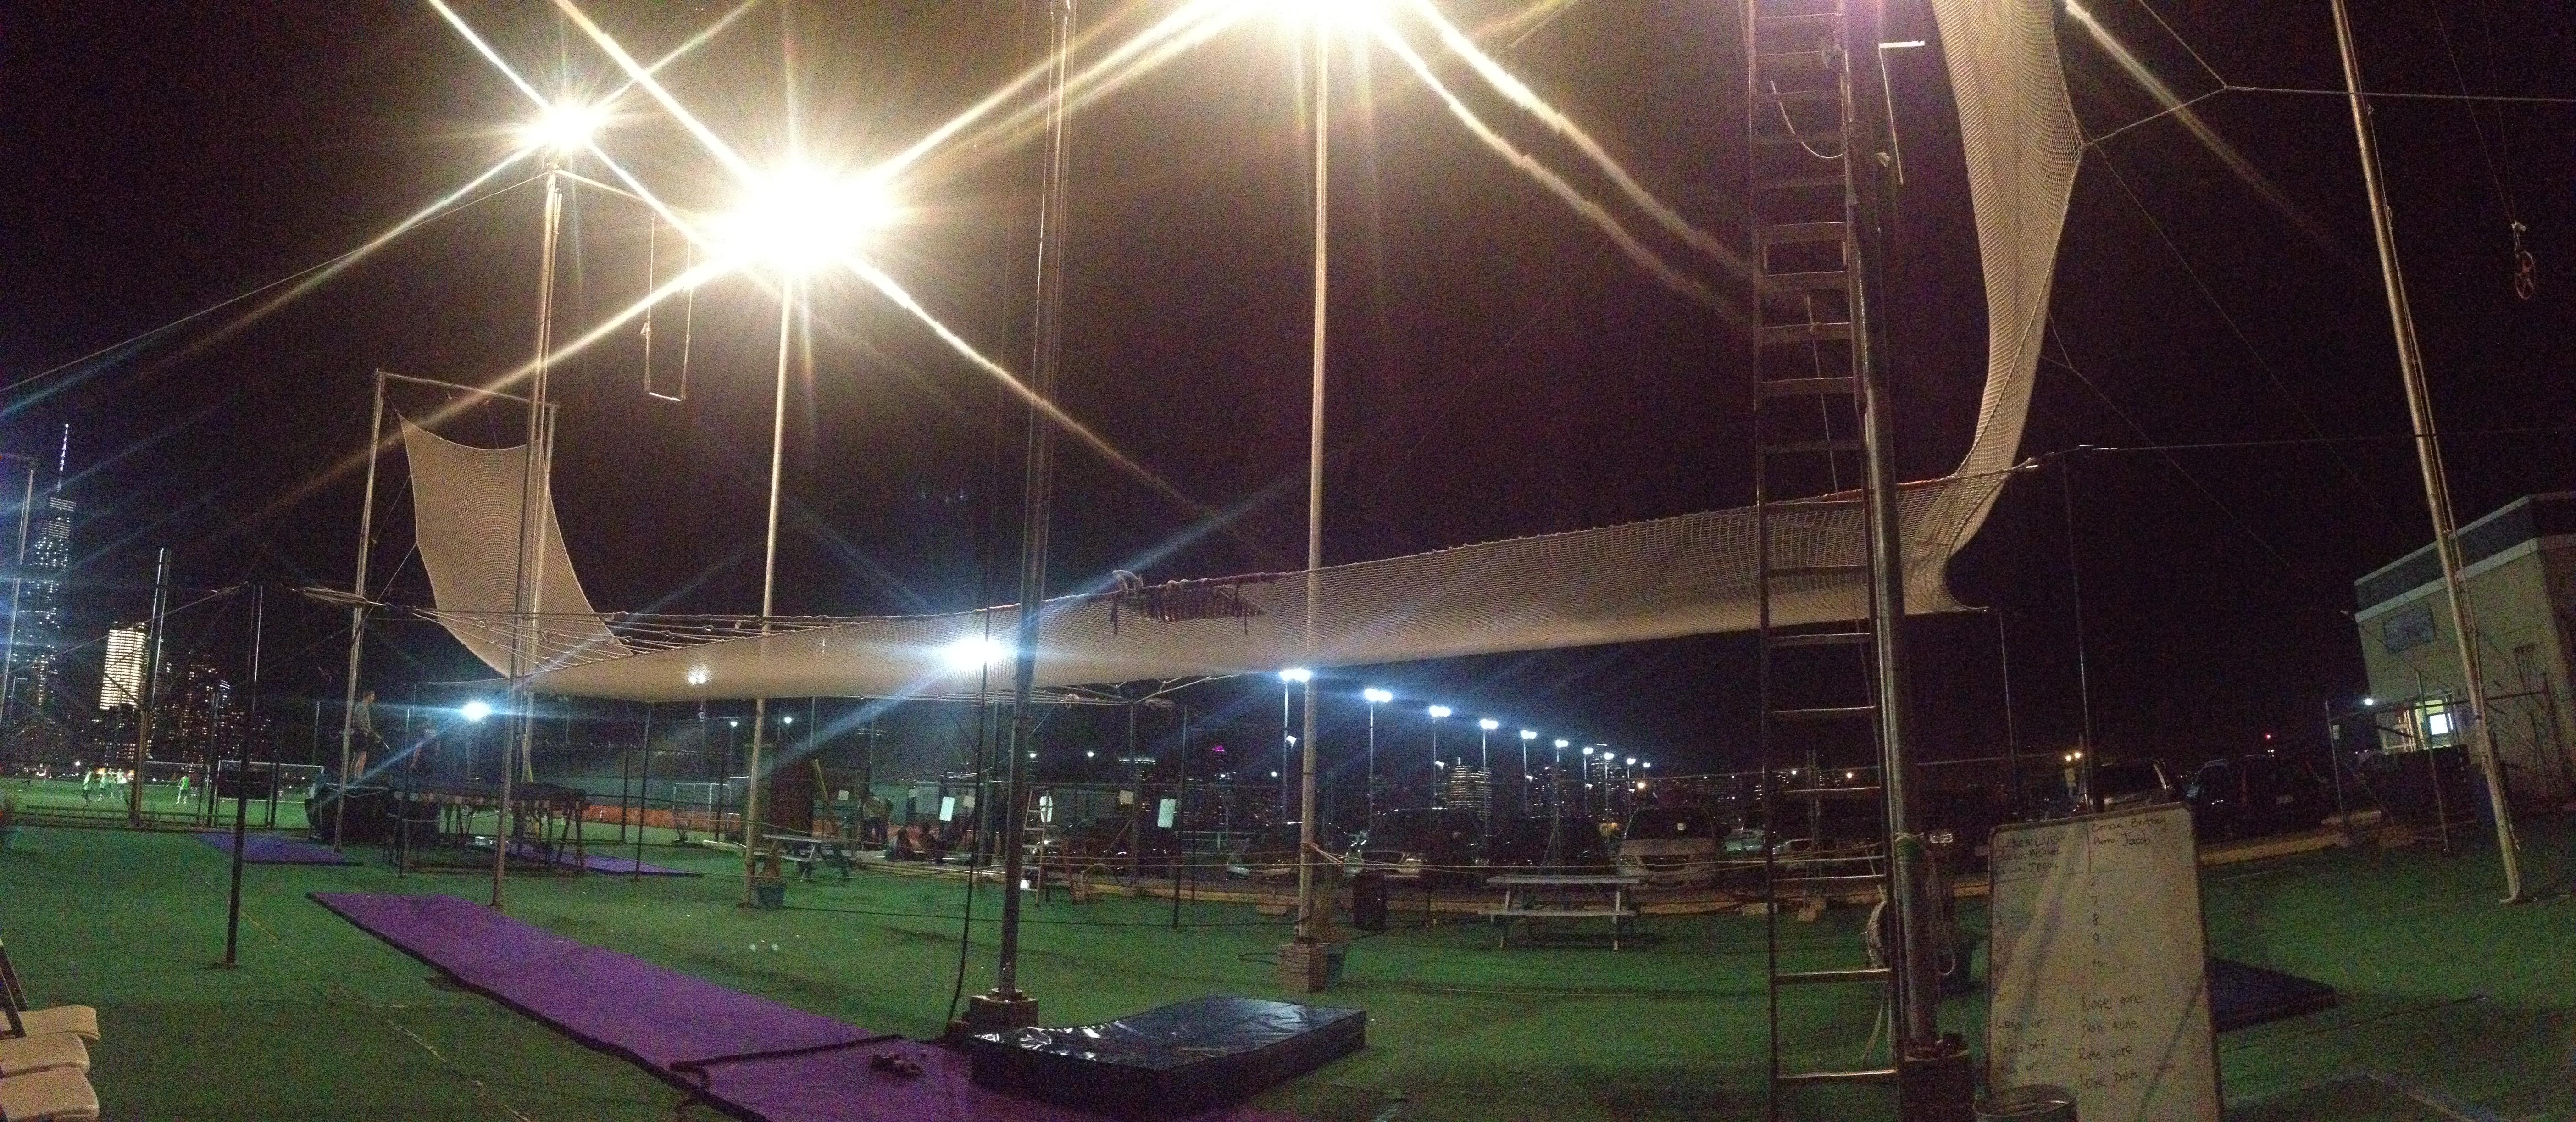 2014-09-24-trapeze2.JPG